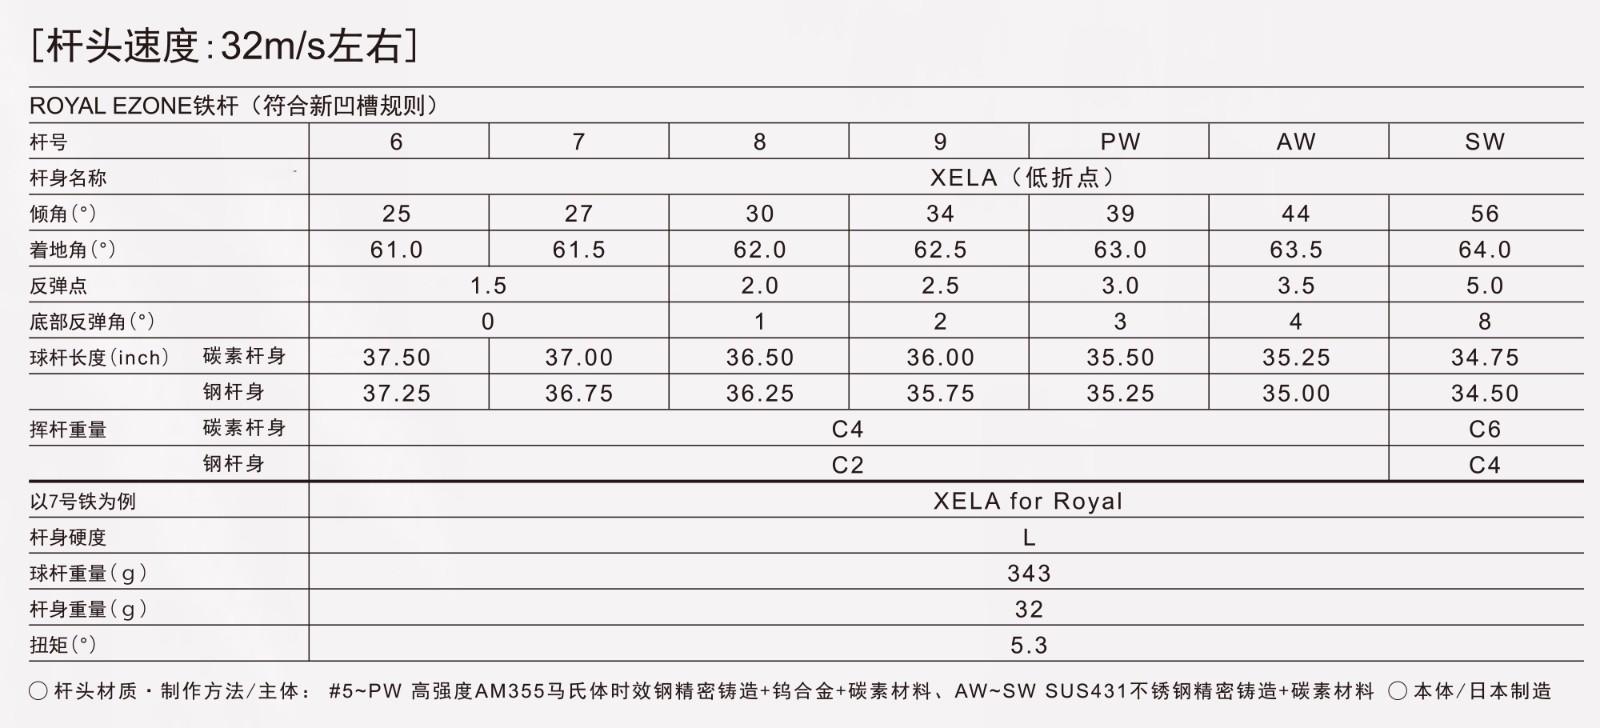 Royal EZONE 铁杆.jpg